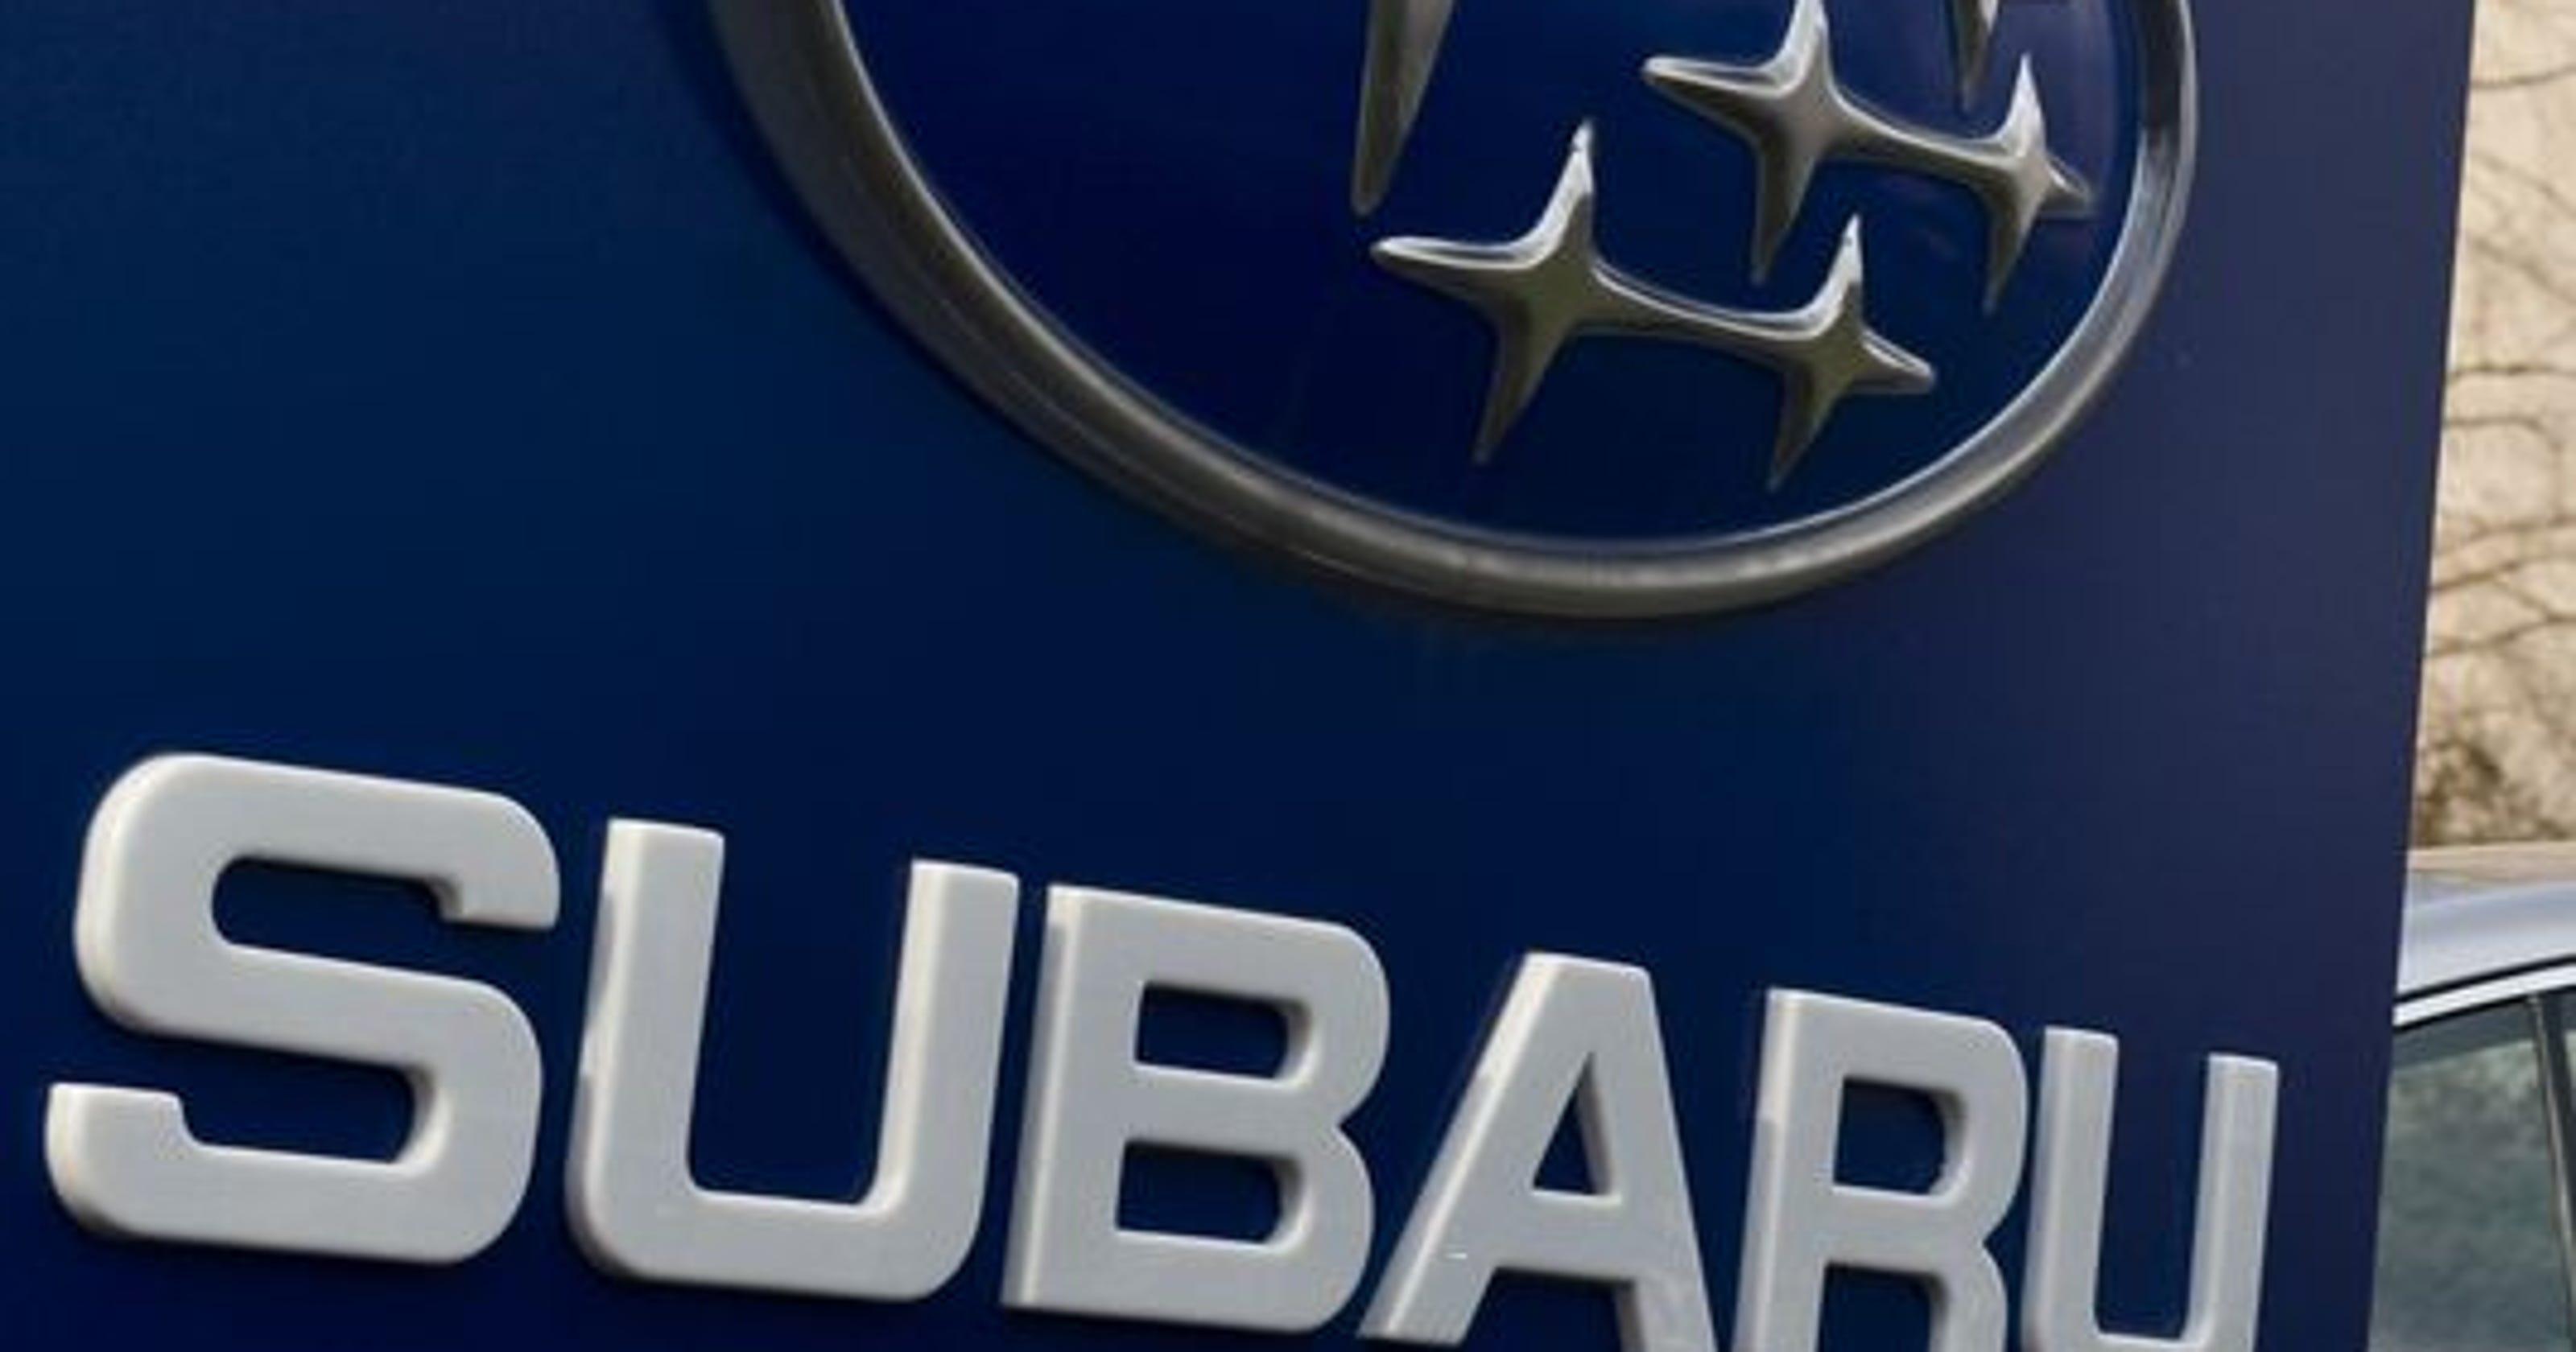 Subaru WRX, STi models have defects, third lawsuit claims